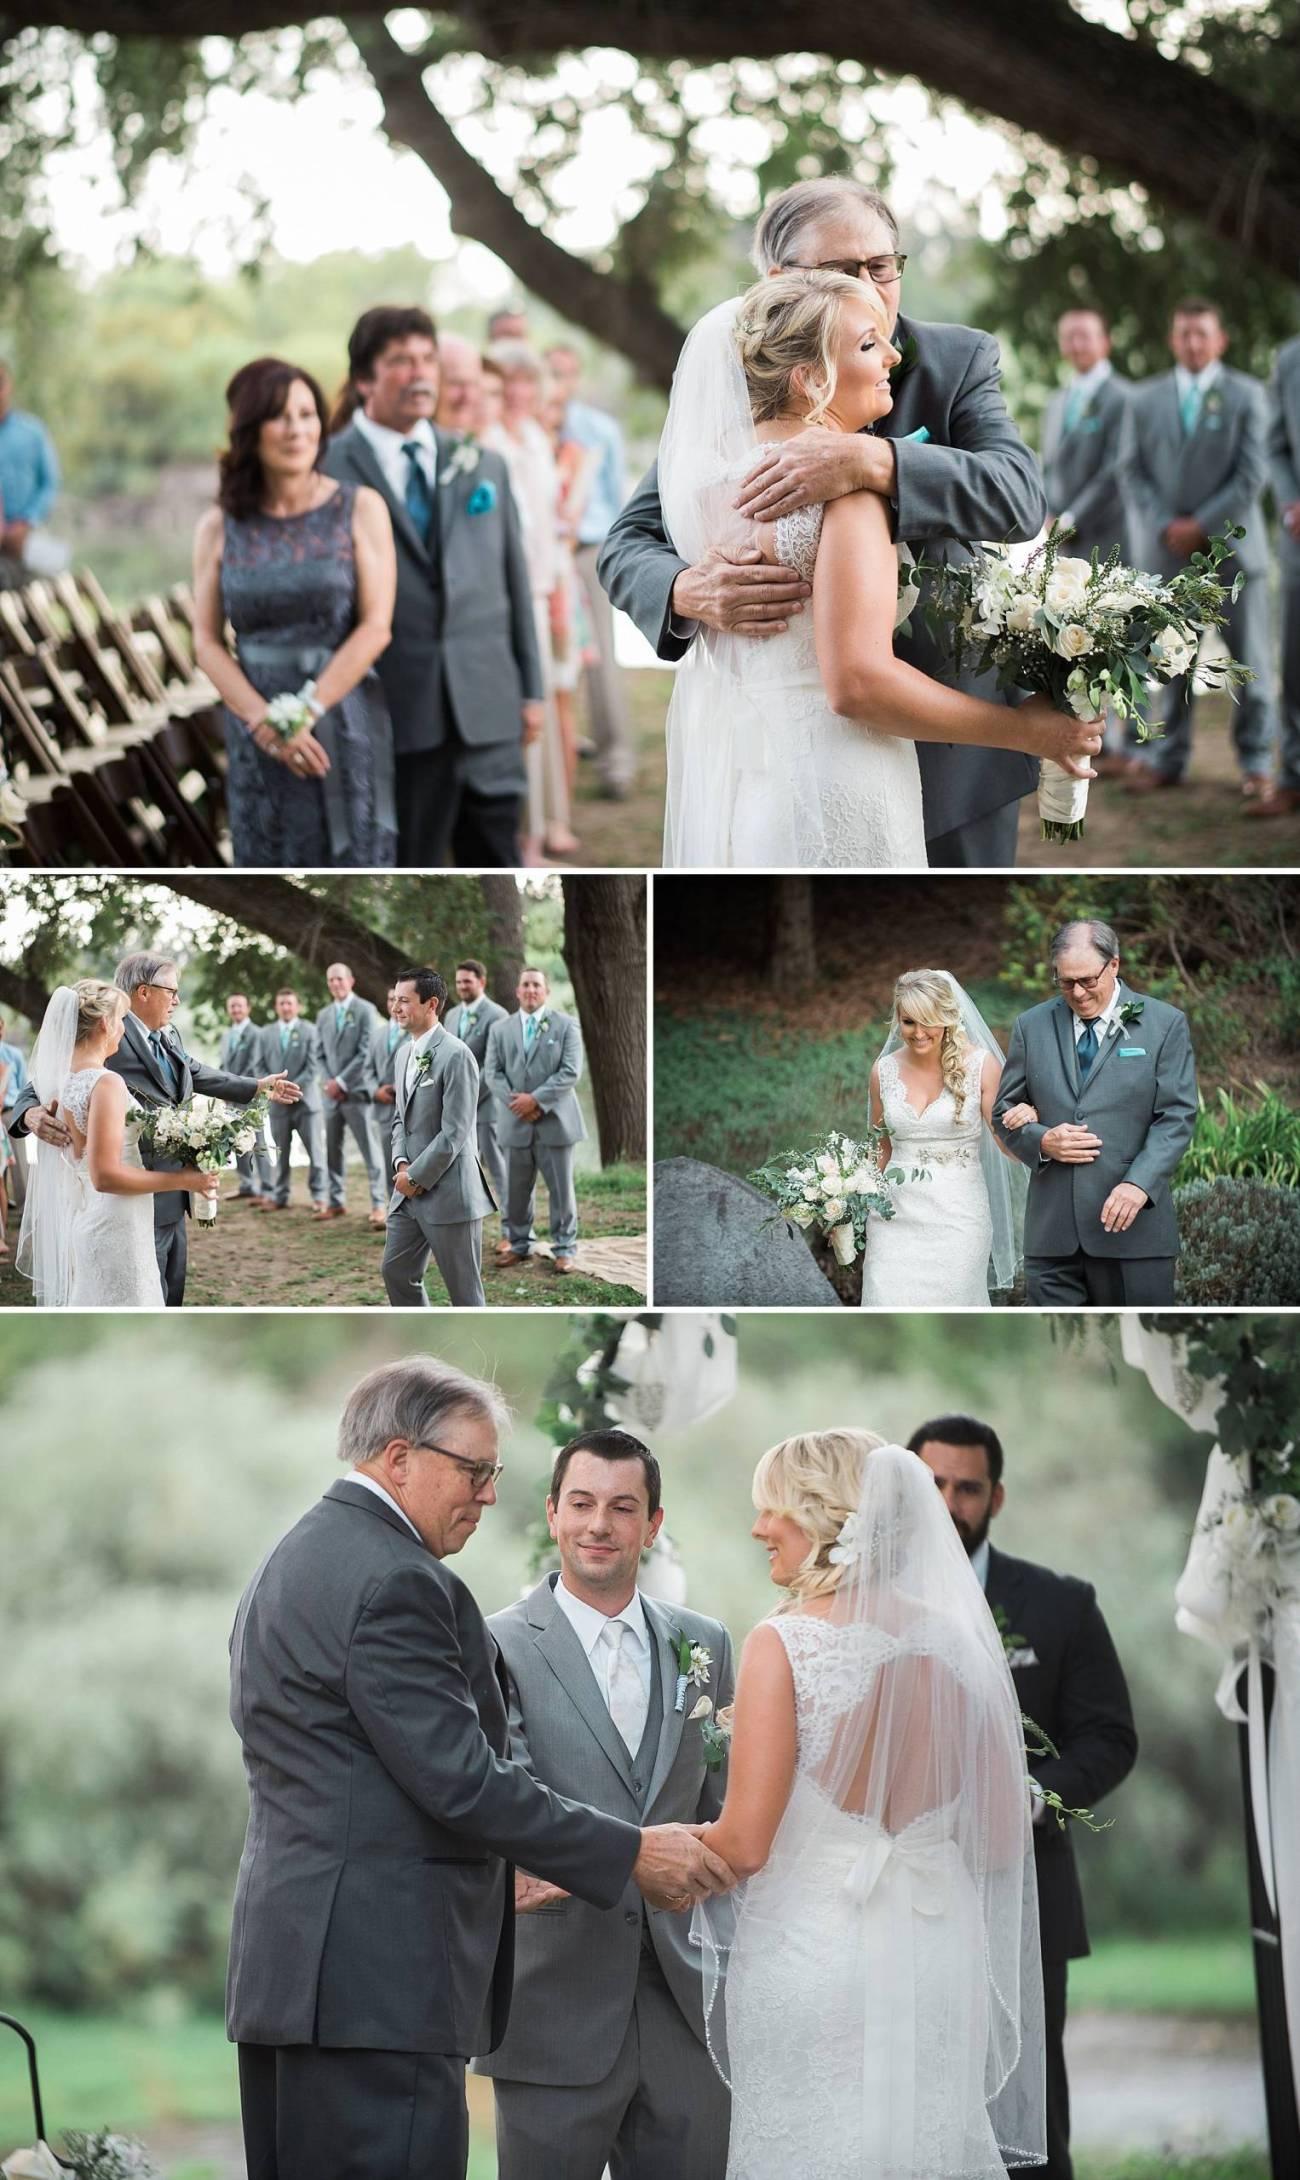 Erin + Marcel Third Element Photography & Cinema Fresno County Estate Wedding Hybrid Film Wedding Photographer_0029